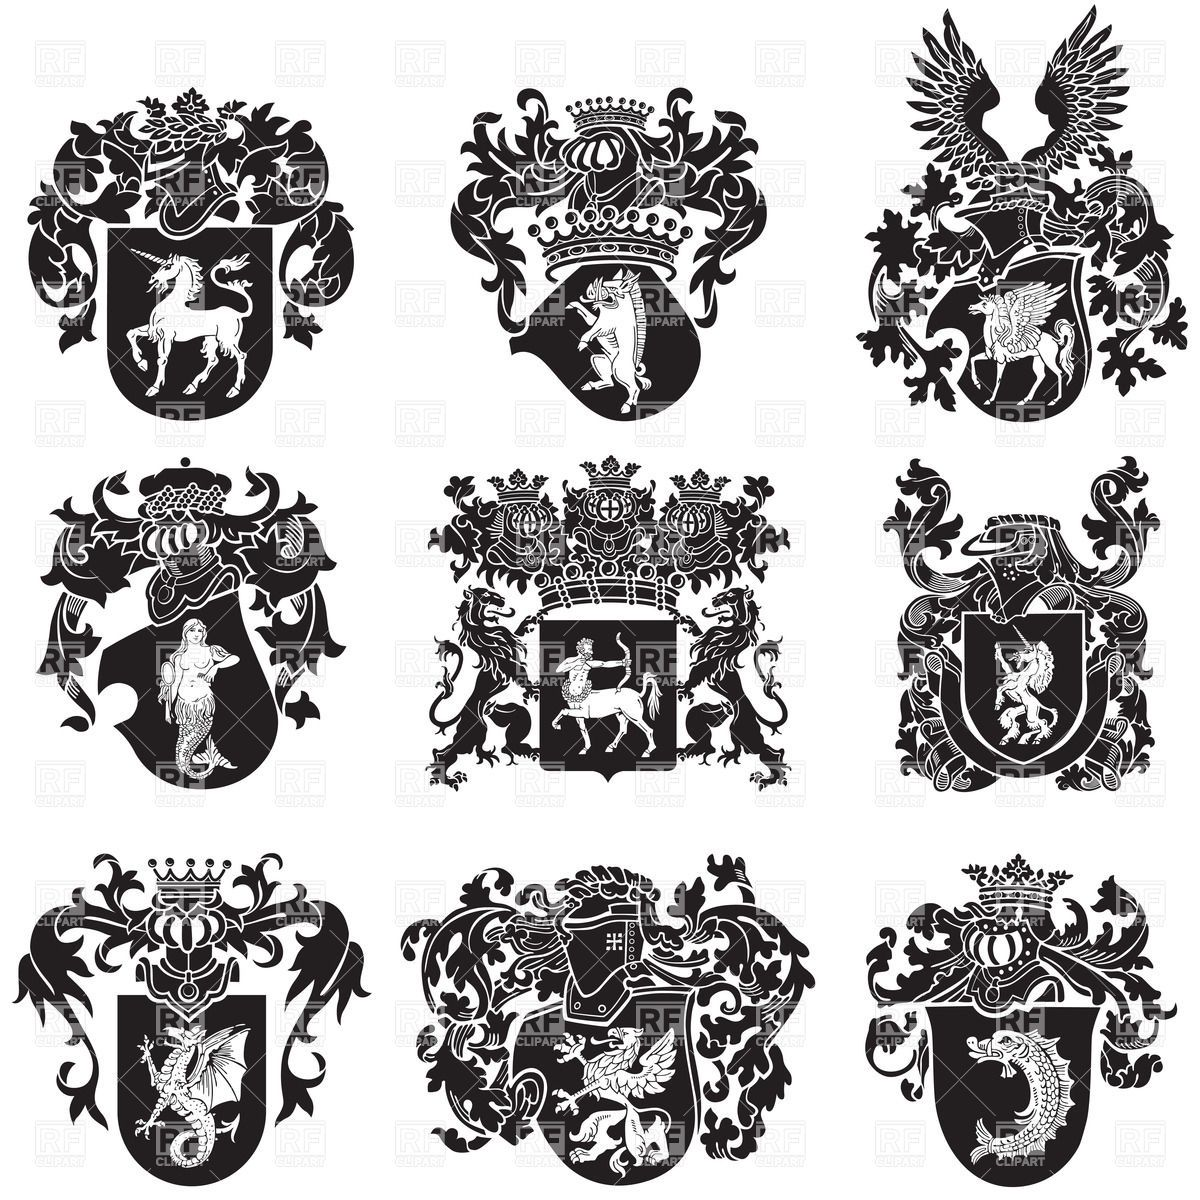 Black heraldic emblems vector. Medieval clipart medieval symbol